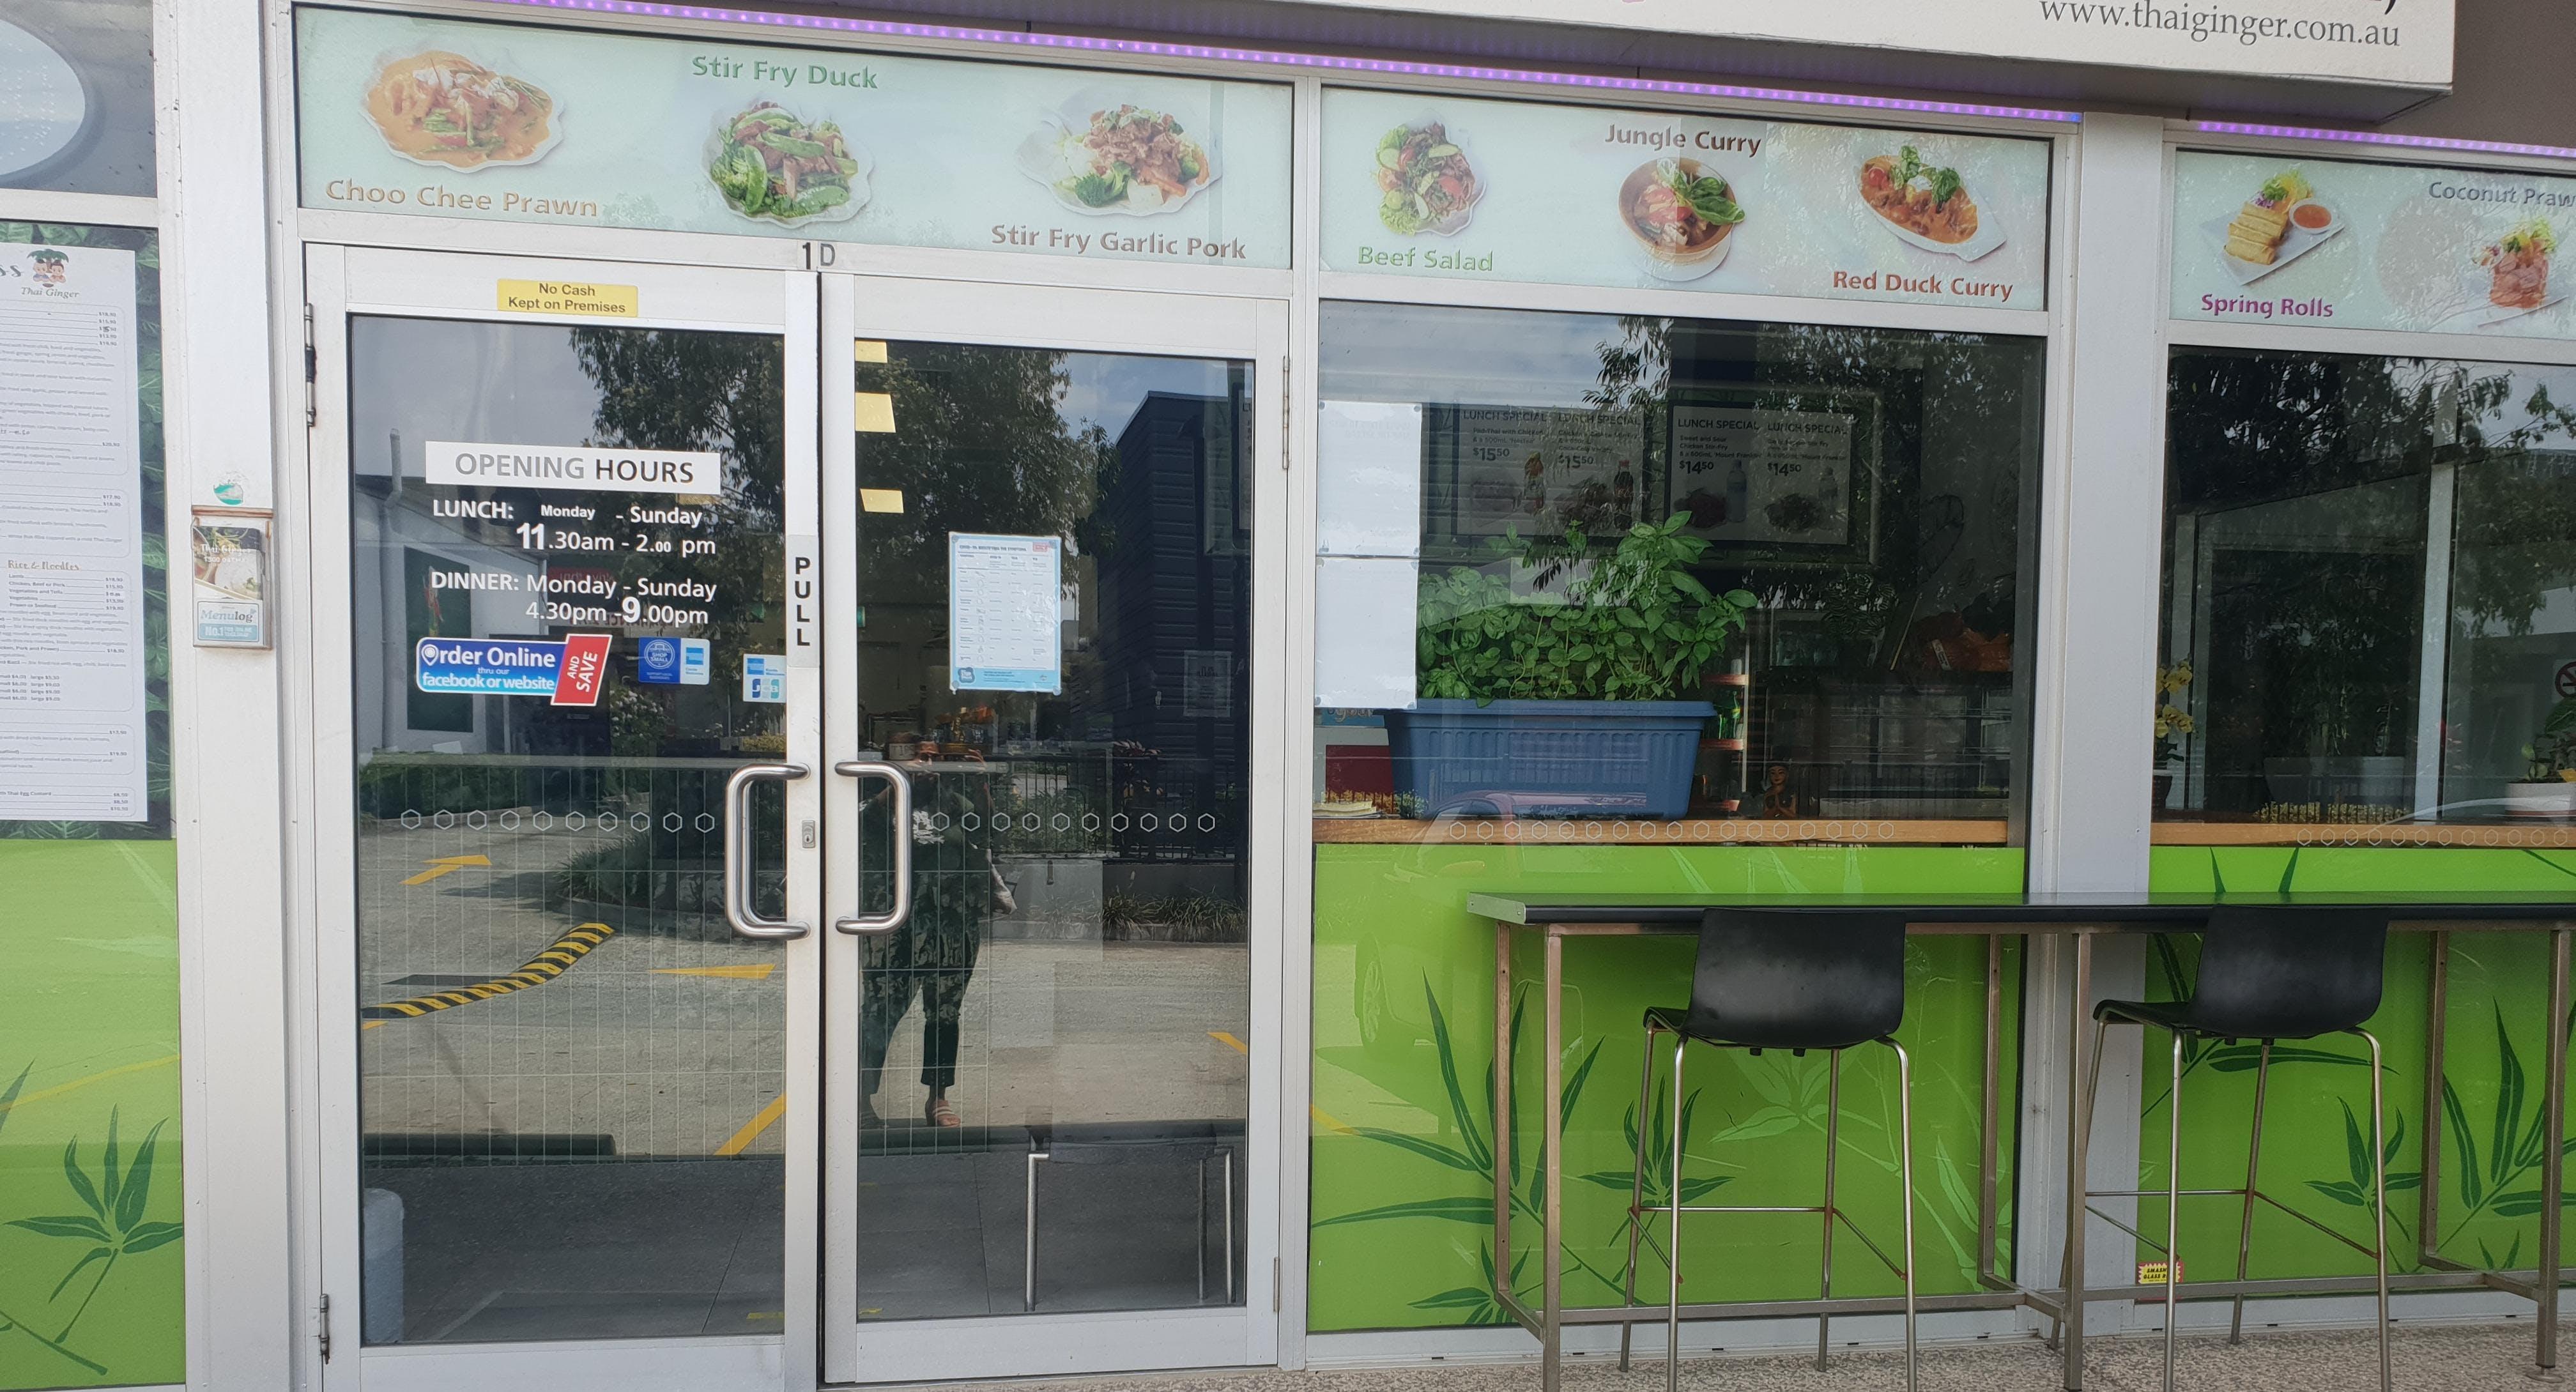 Photo of restaurant Thai Ginger in North Lakes, Brisbane